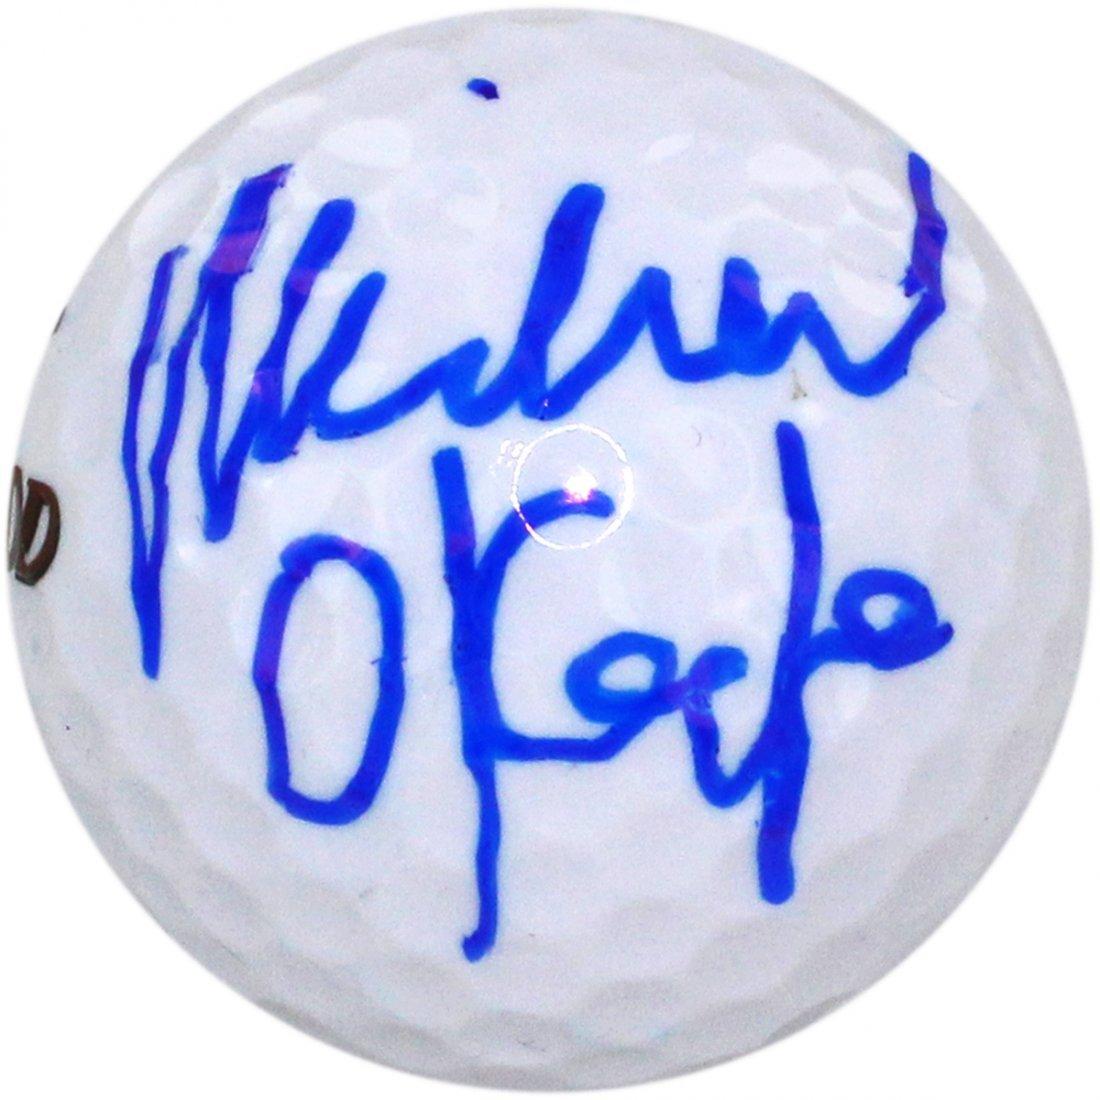 Michael O'Keefe Signed Bushwood Logo Golf Ball